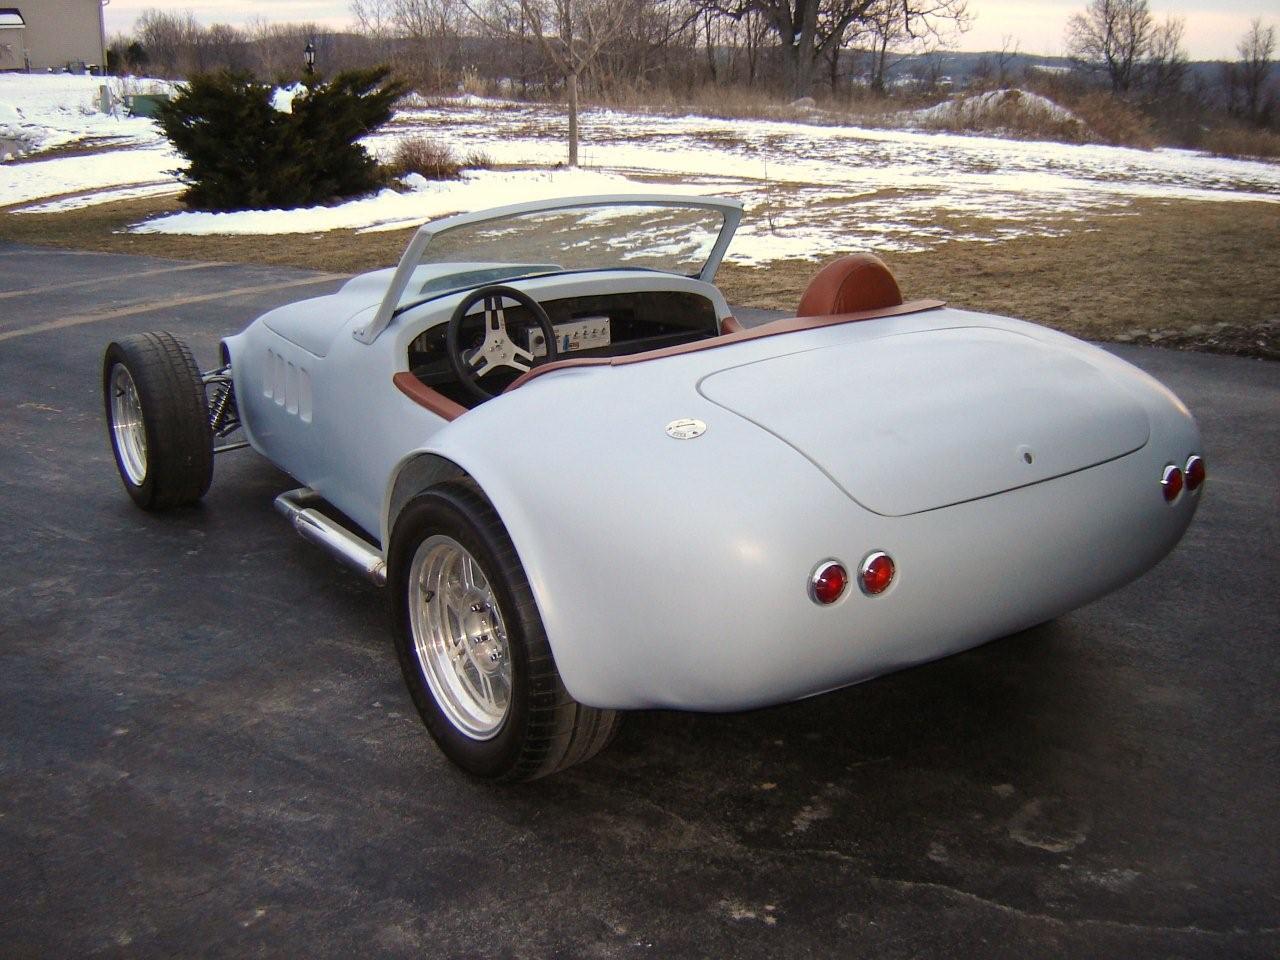 Fine Kit Car Body For Sale Composition - Classic Cars Ideas - boiq.info